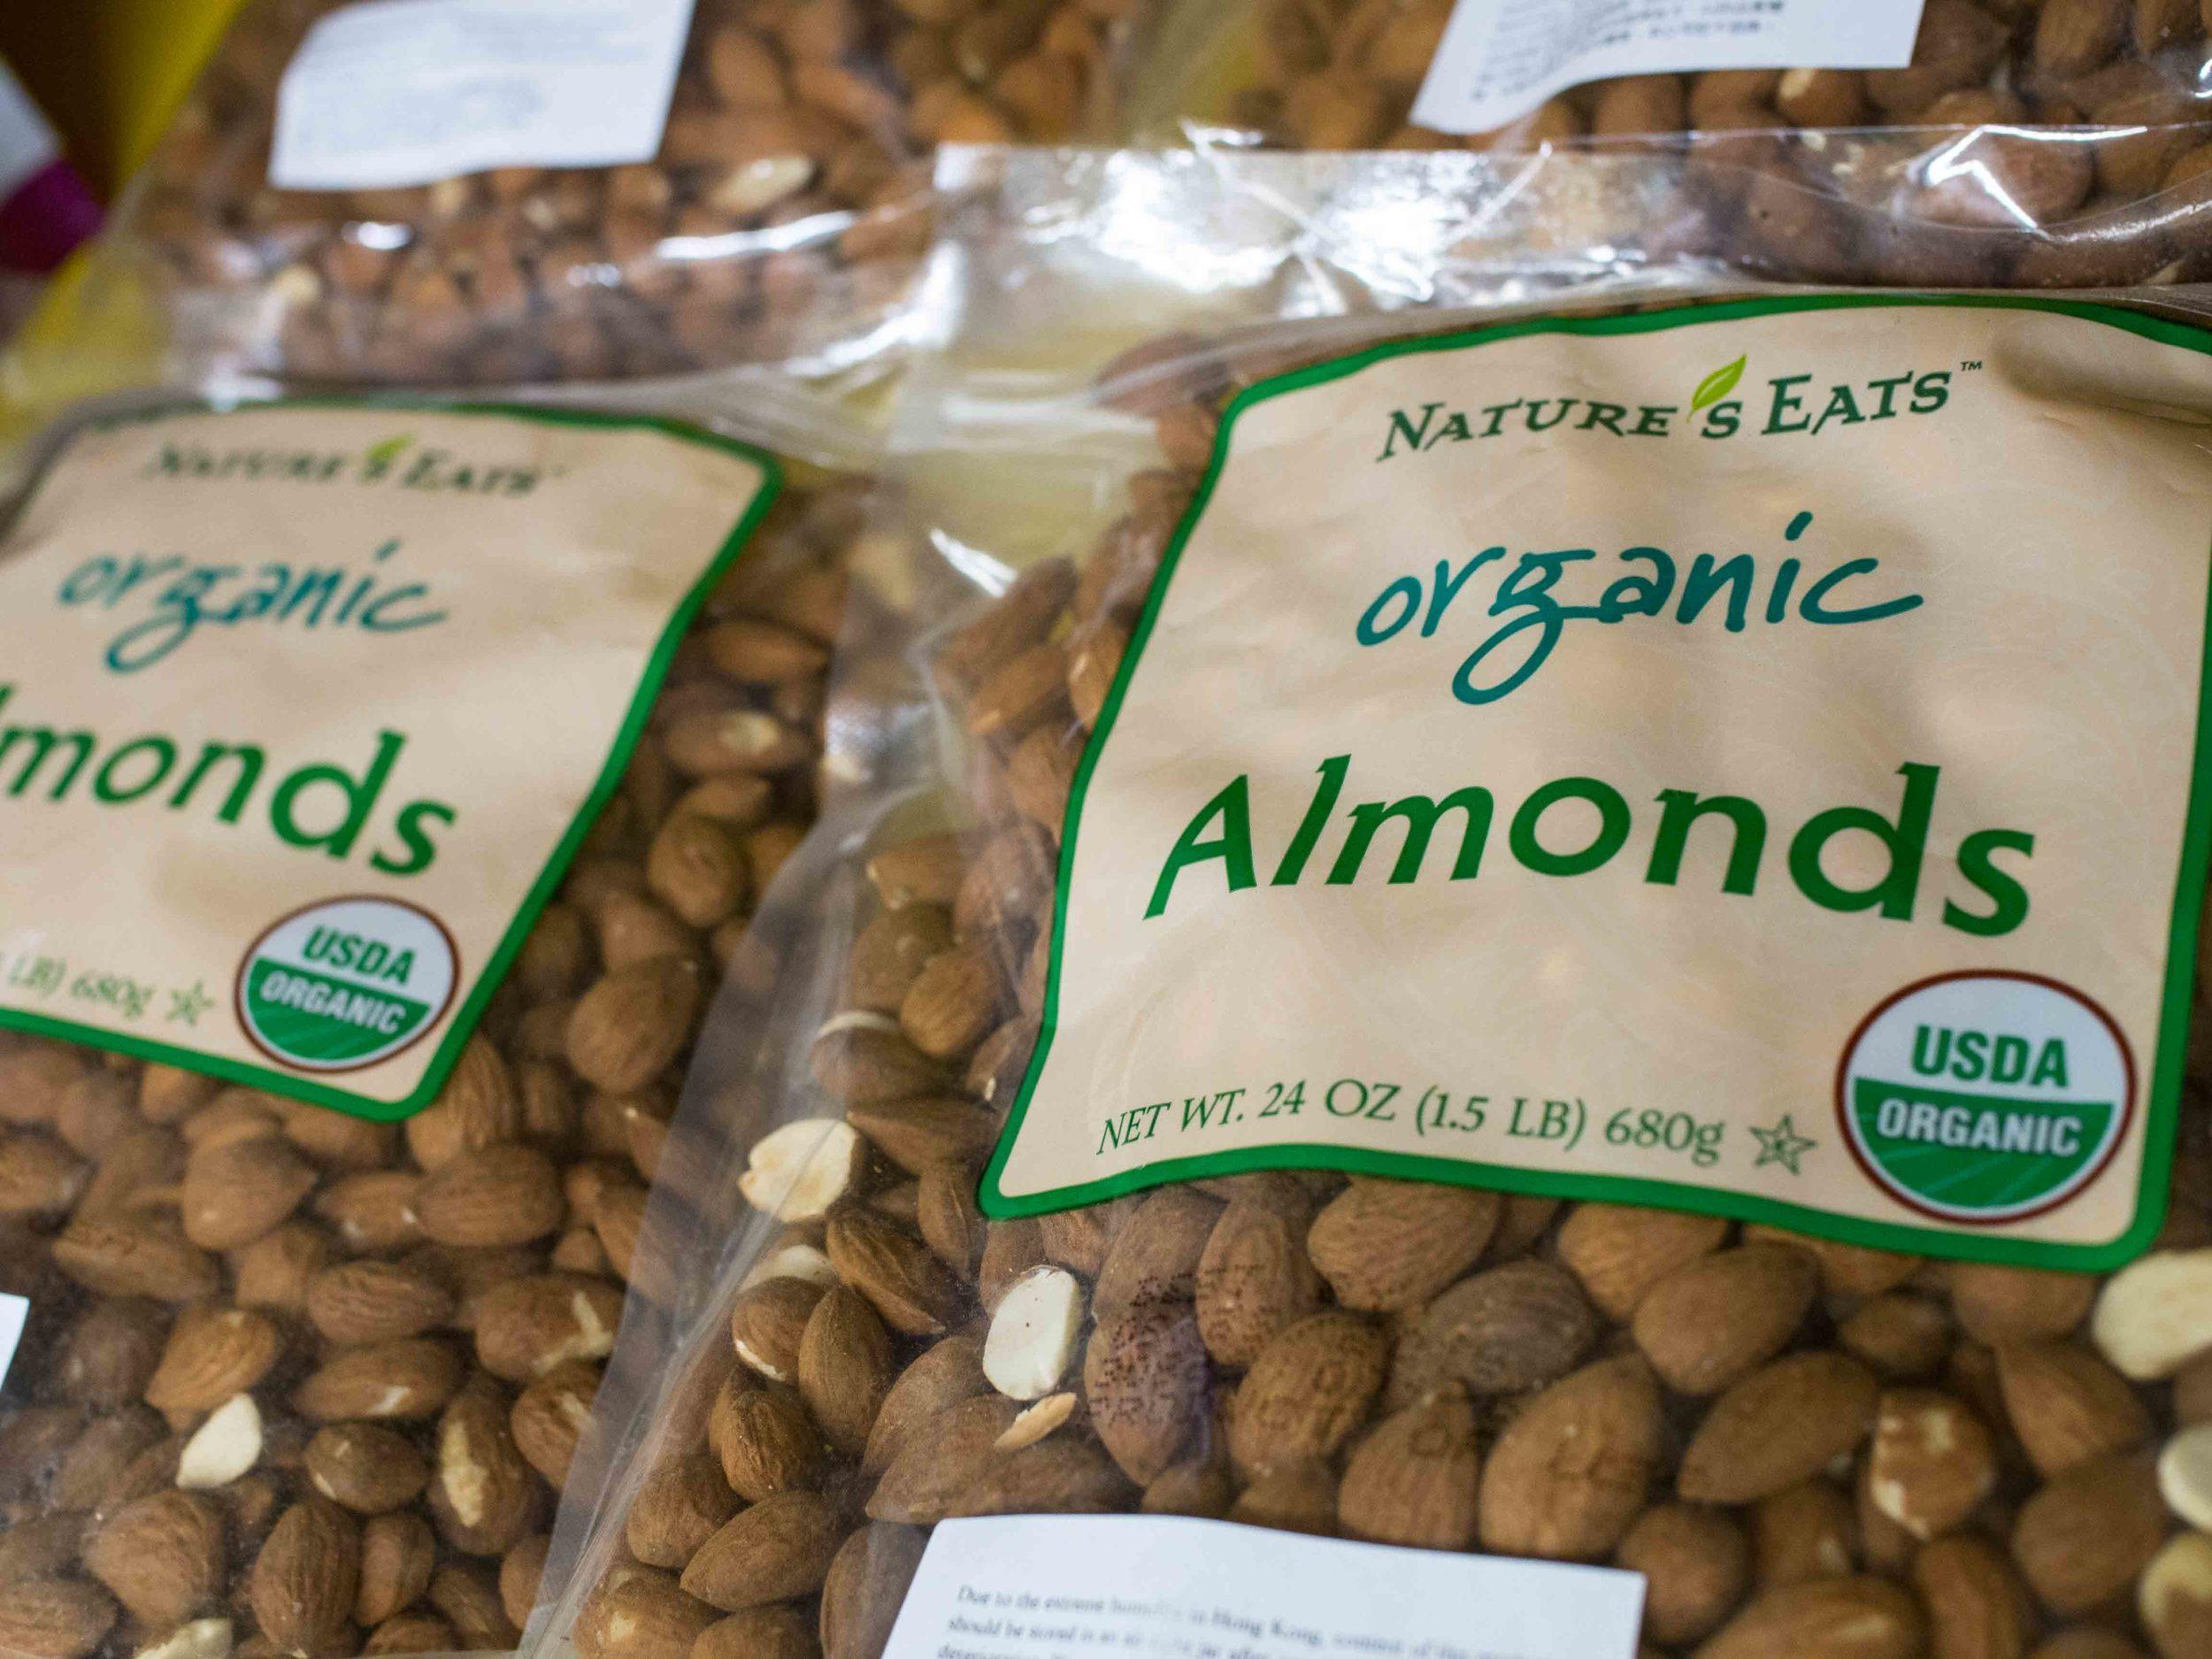 Nature's Eats Organic Almond